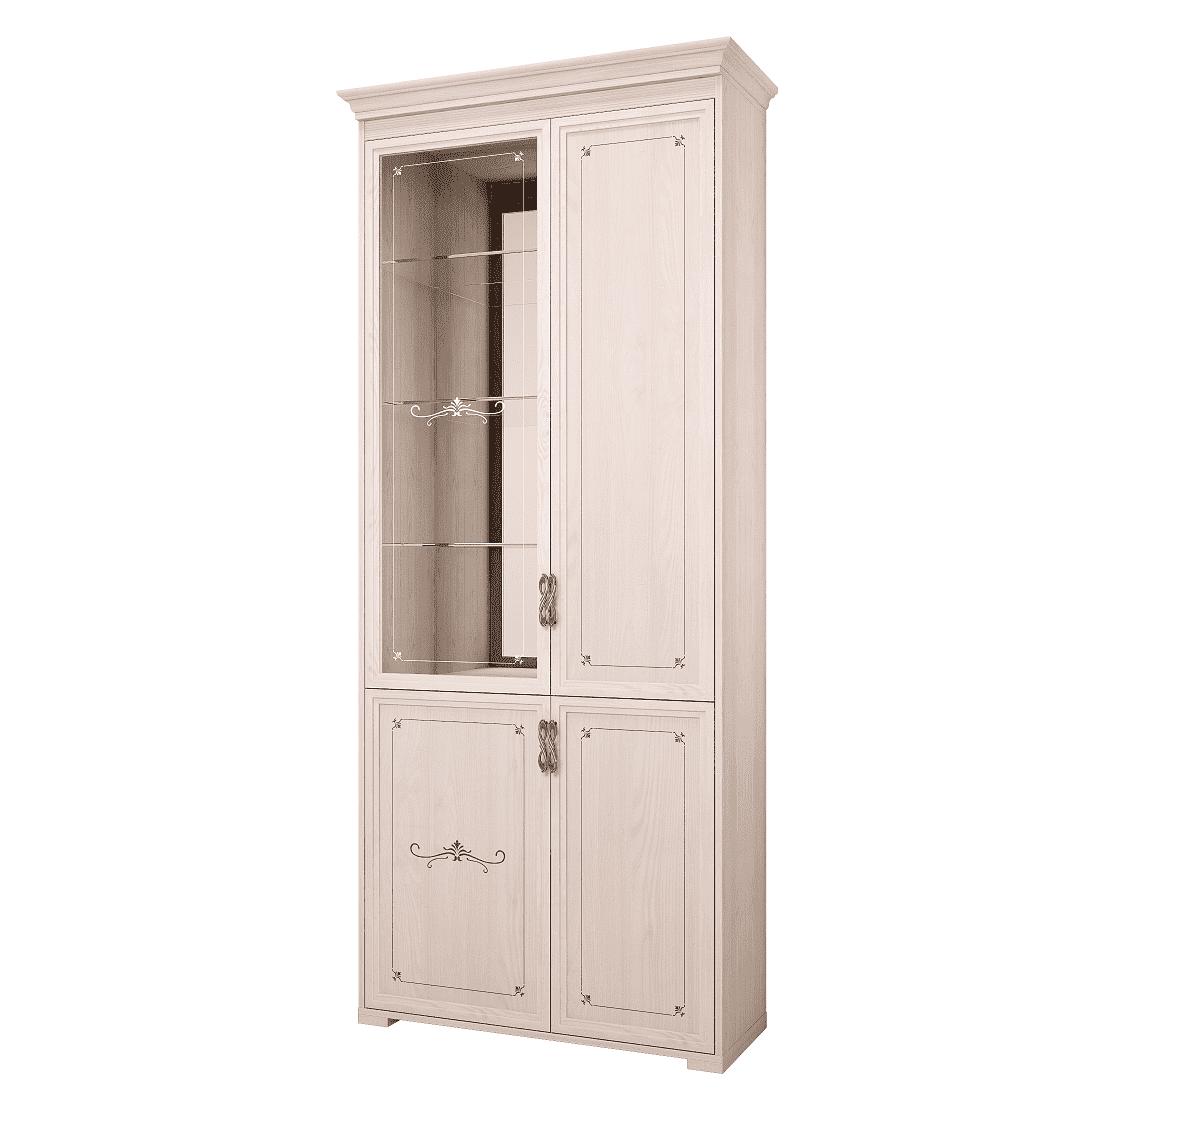 Шкаф для книг Афродита 10, без карниза